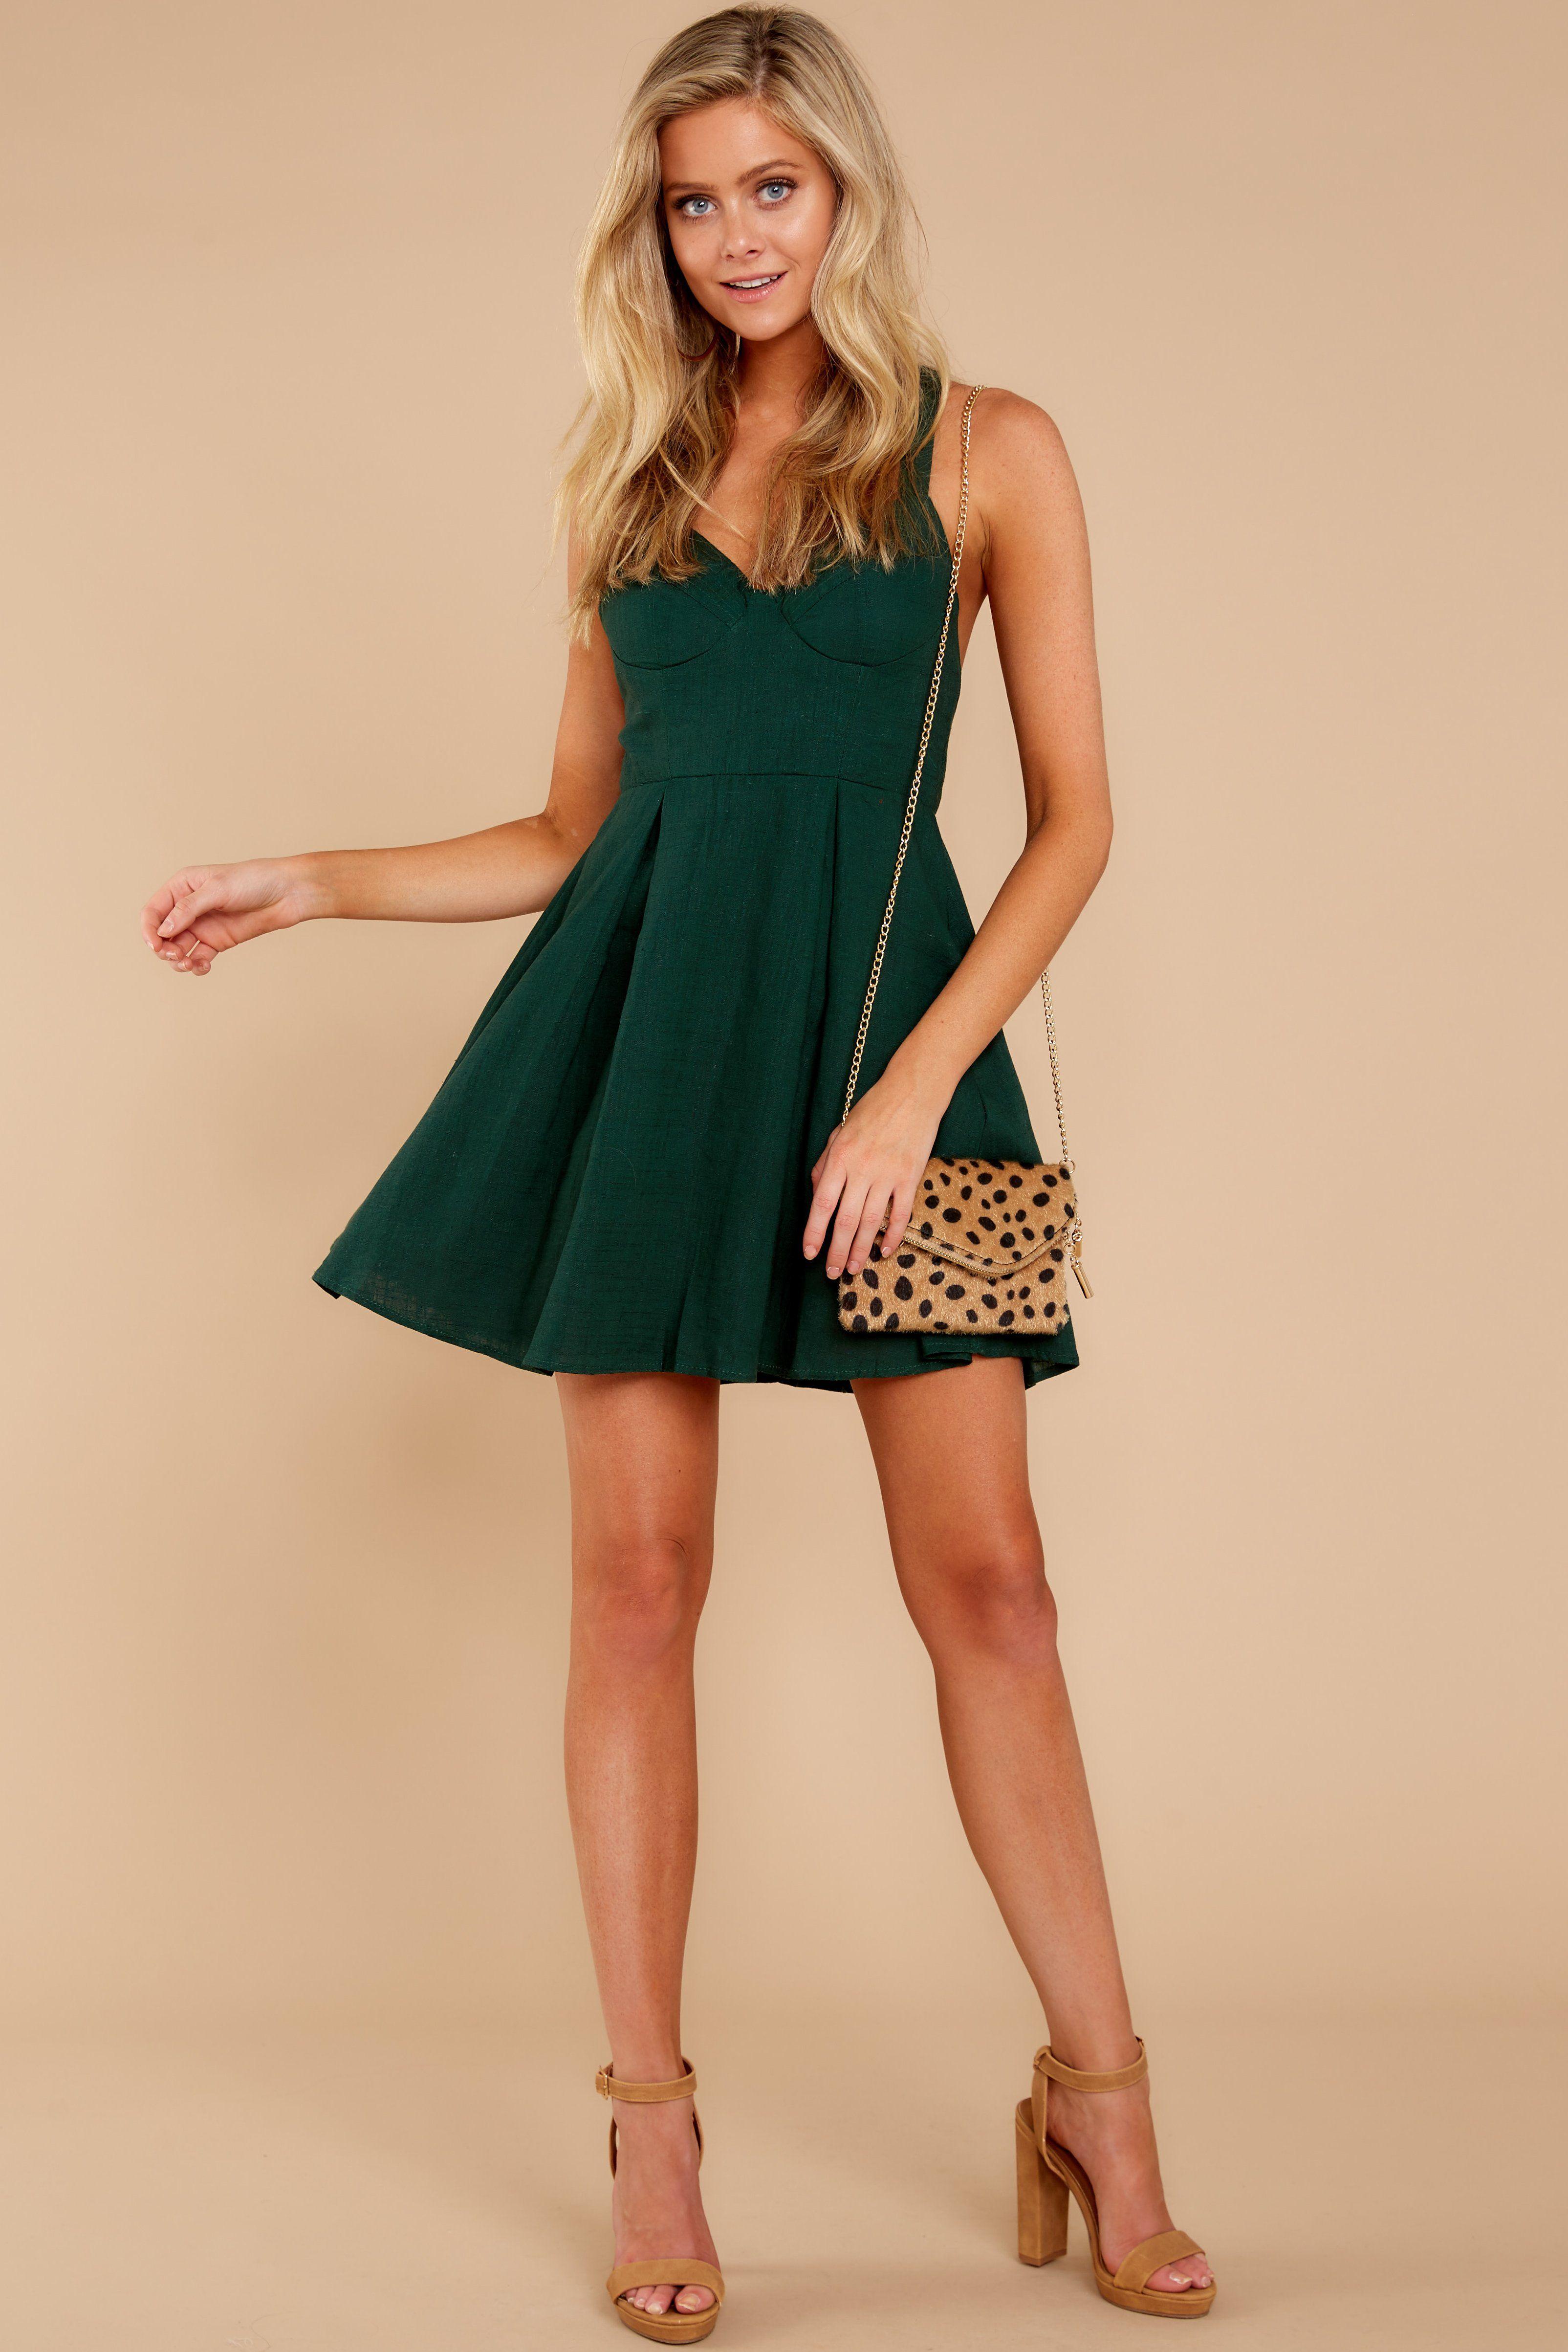 2ebb5d6c030 Sexy Dark Green Dress - Flirty Mini - Short Dress -  44.00 – Red Dress  Boutique